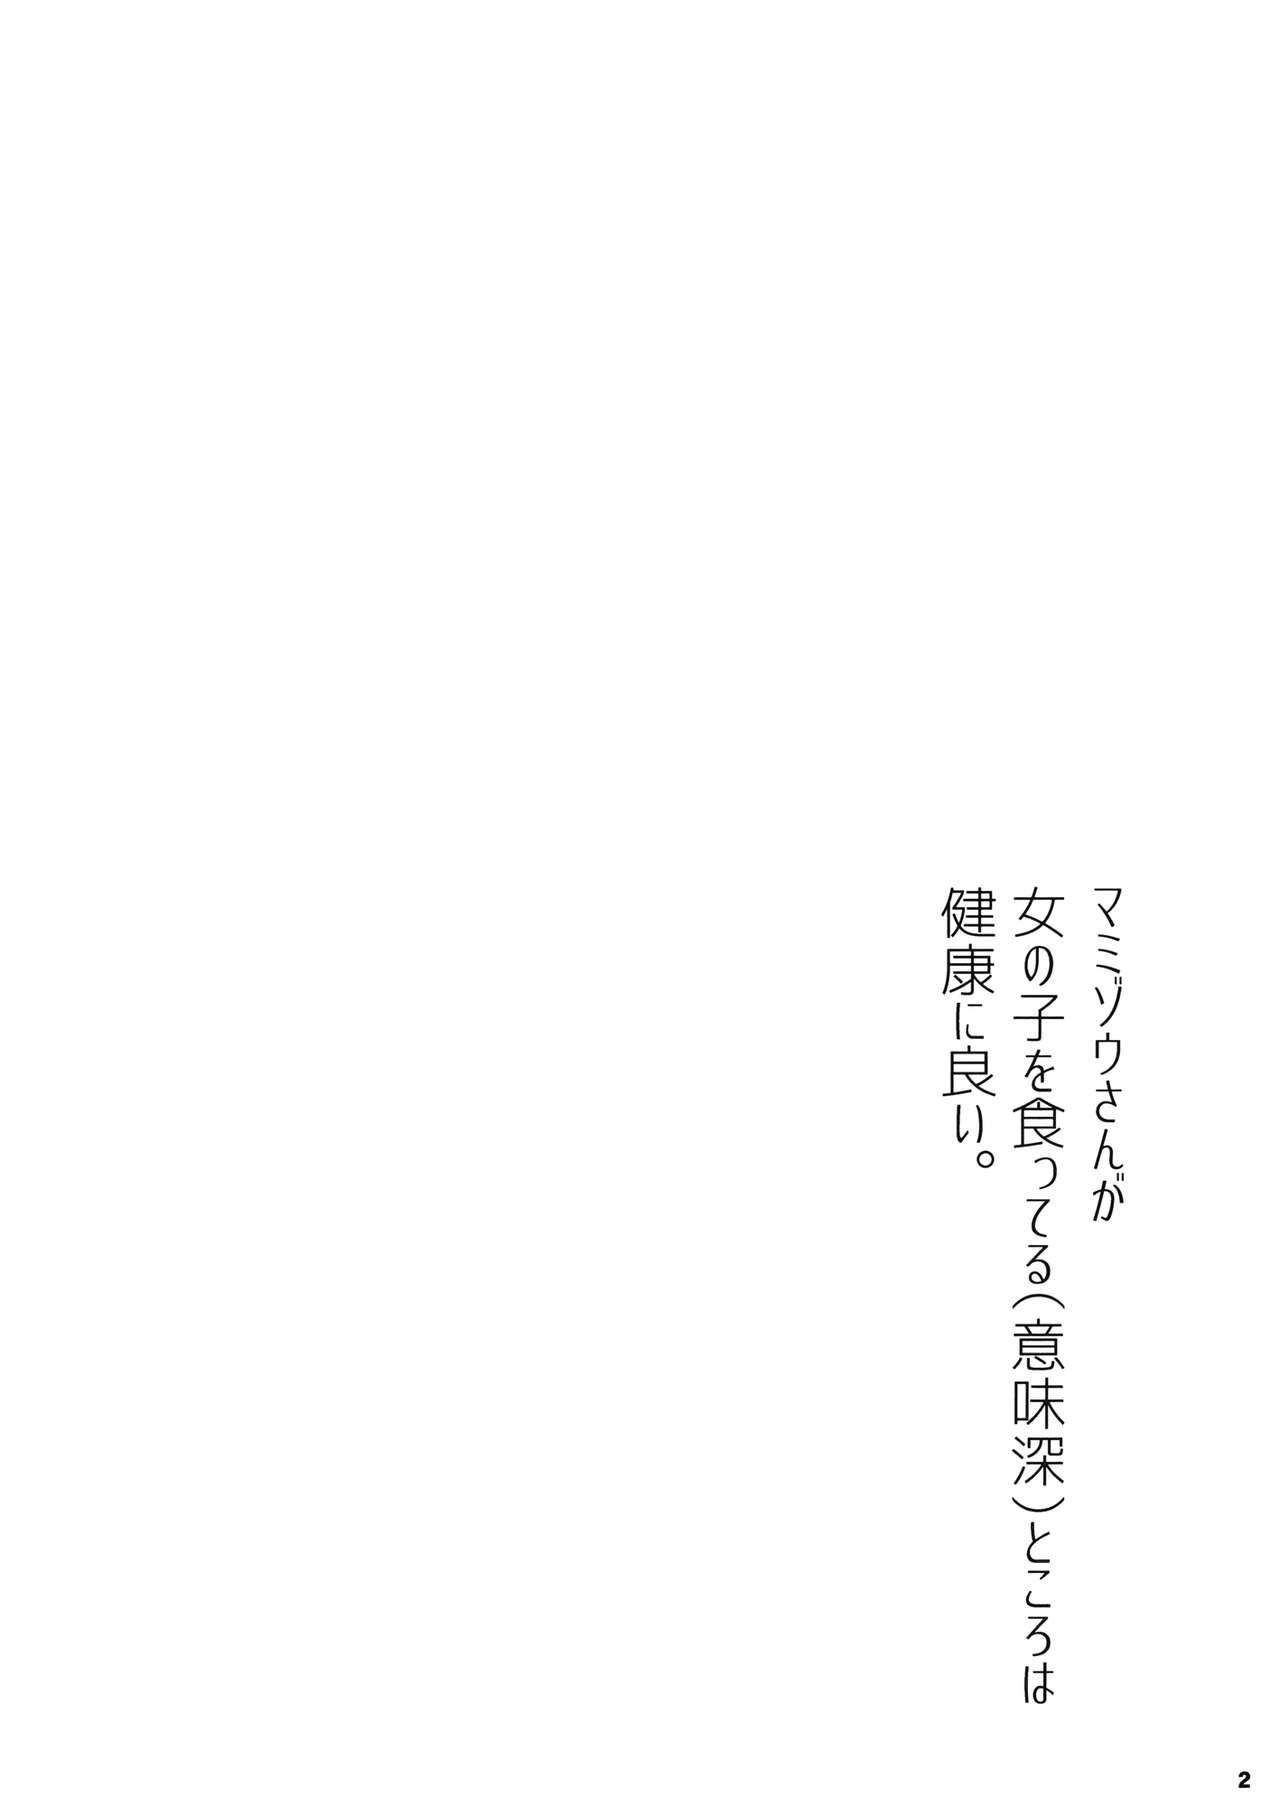 Ochiru Otome to Bakedanuki 2